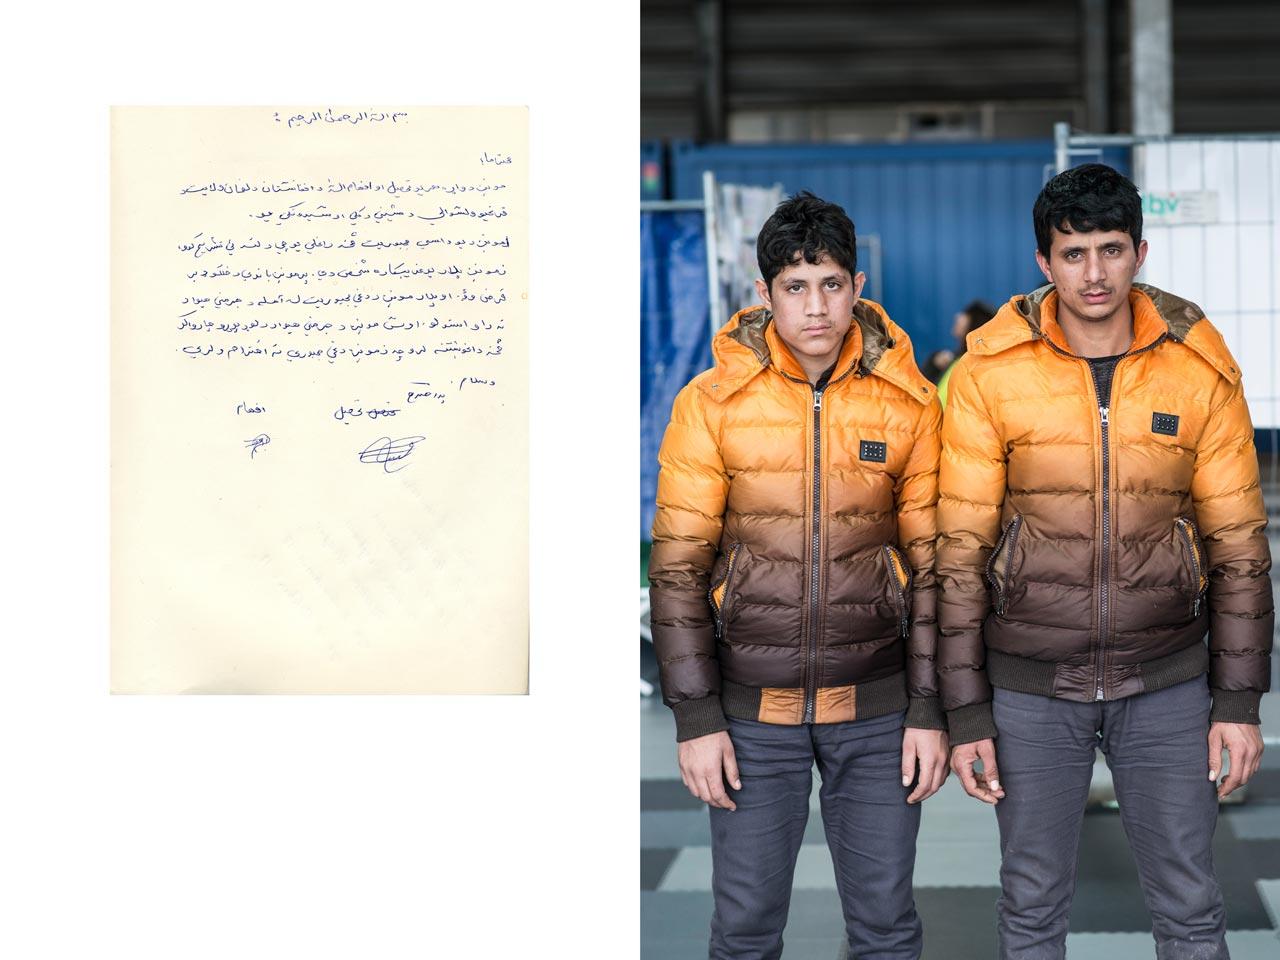 Die Brüder Tahsel (17) und Efhamullah Sedequi (18) sind aus Laghman, Afghanistan geflohen.